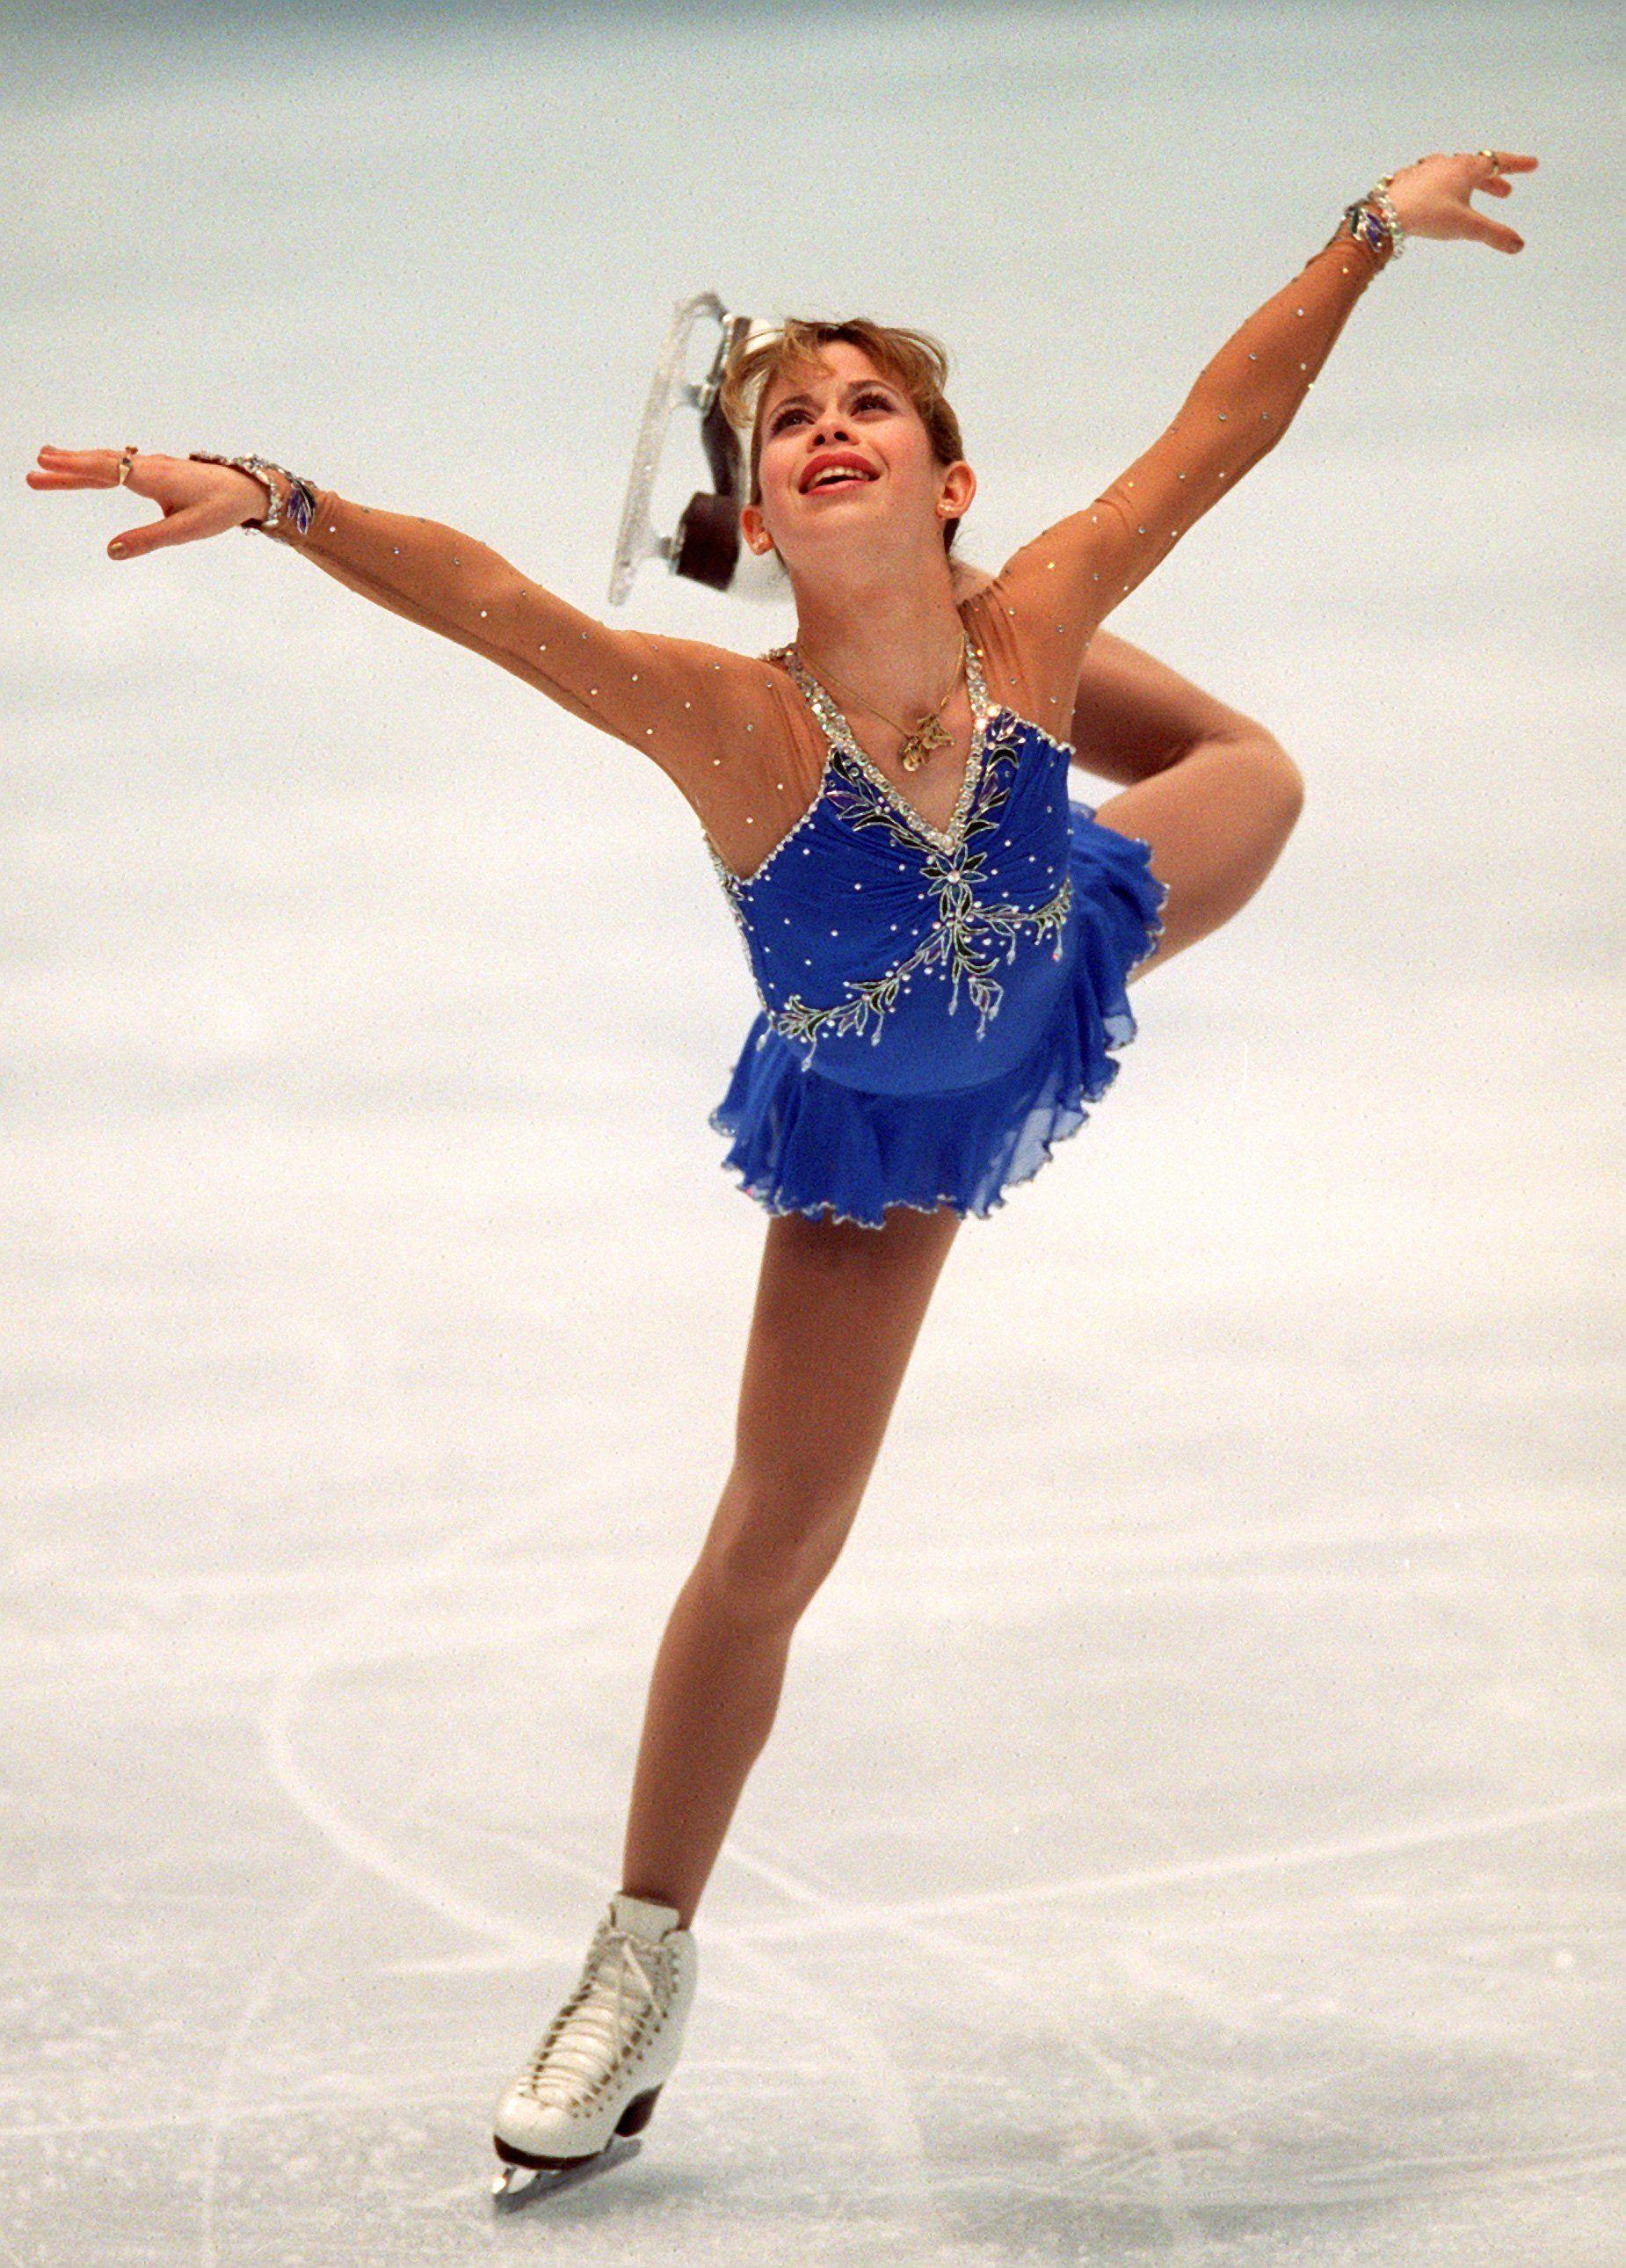 Image result for tara lipinski skater